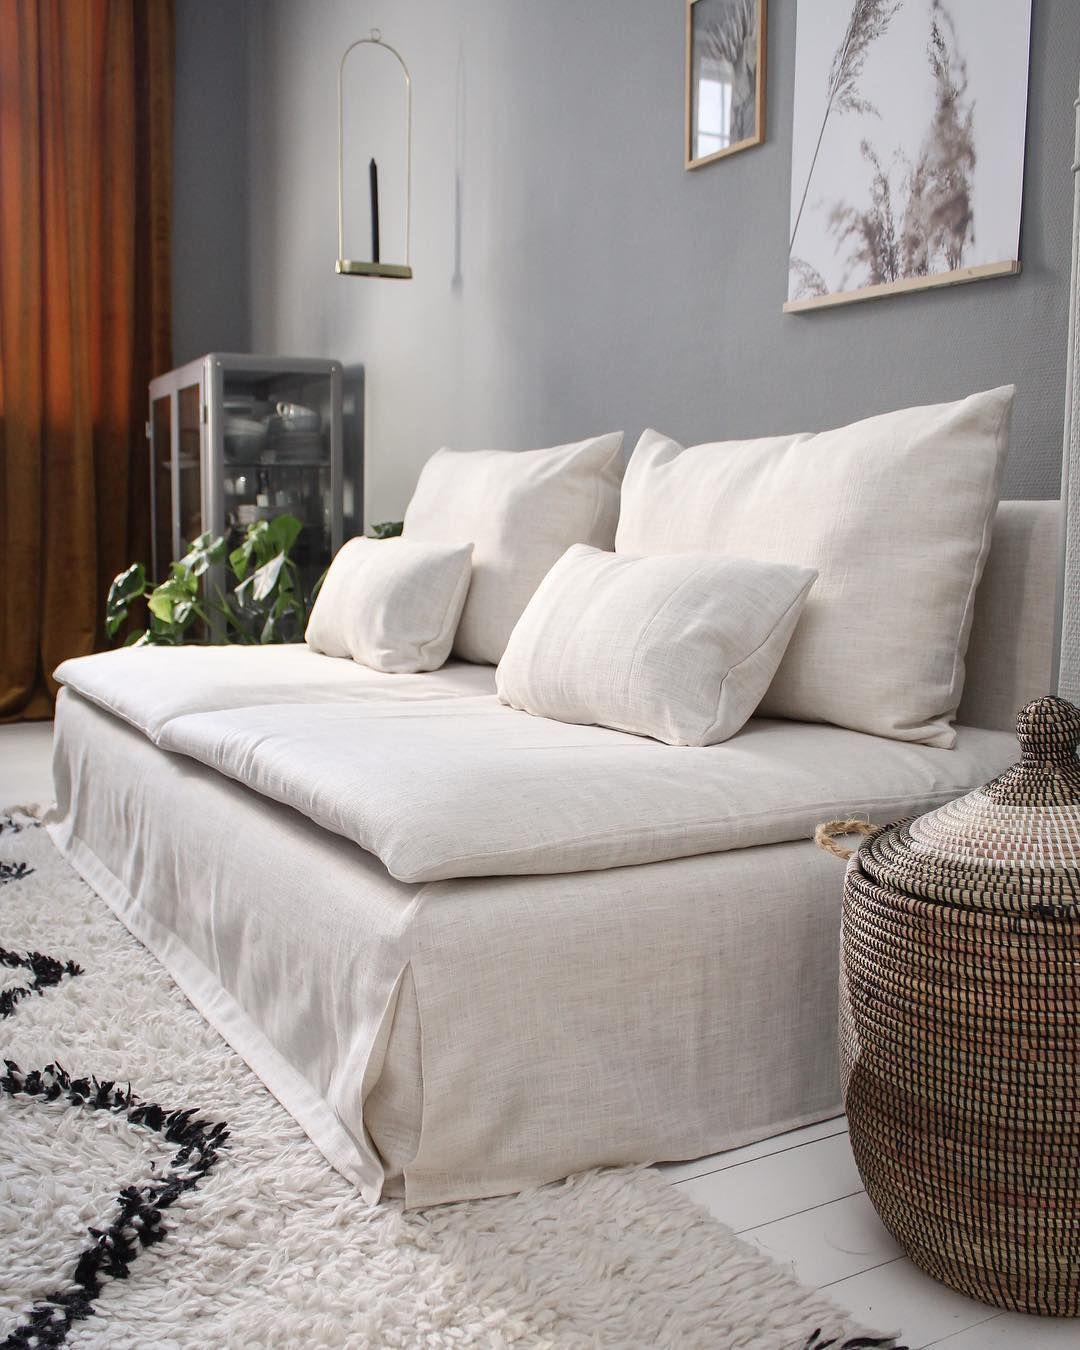 You Can Never Go Wrong With Crisp Clean White Linen Like Majasode White Linen Sofa Ikea Living Room Sofa Ikea Sofa Covers Dream Living Rooms